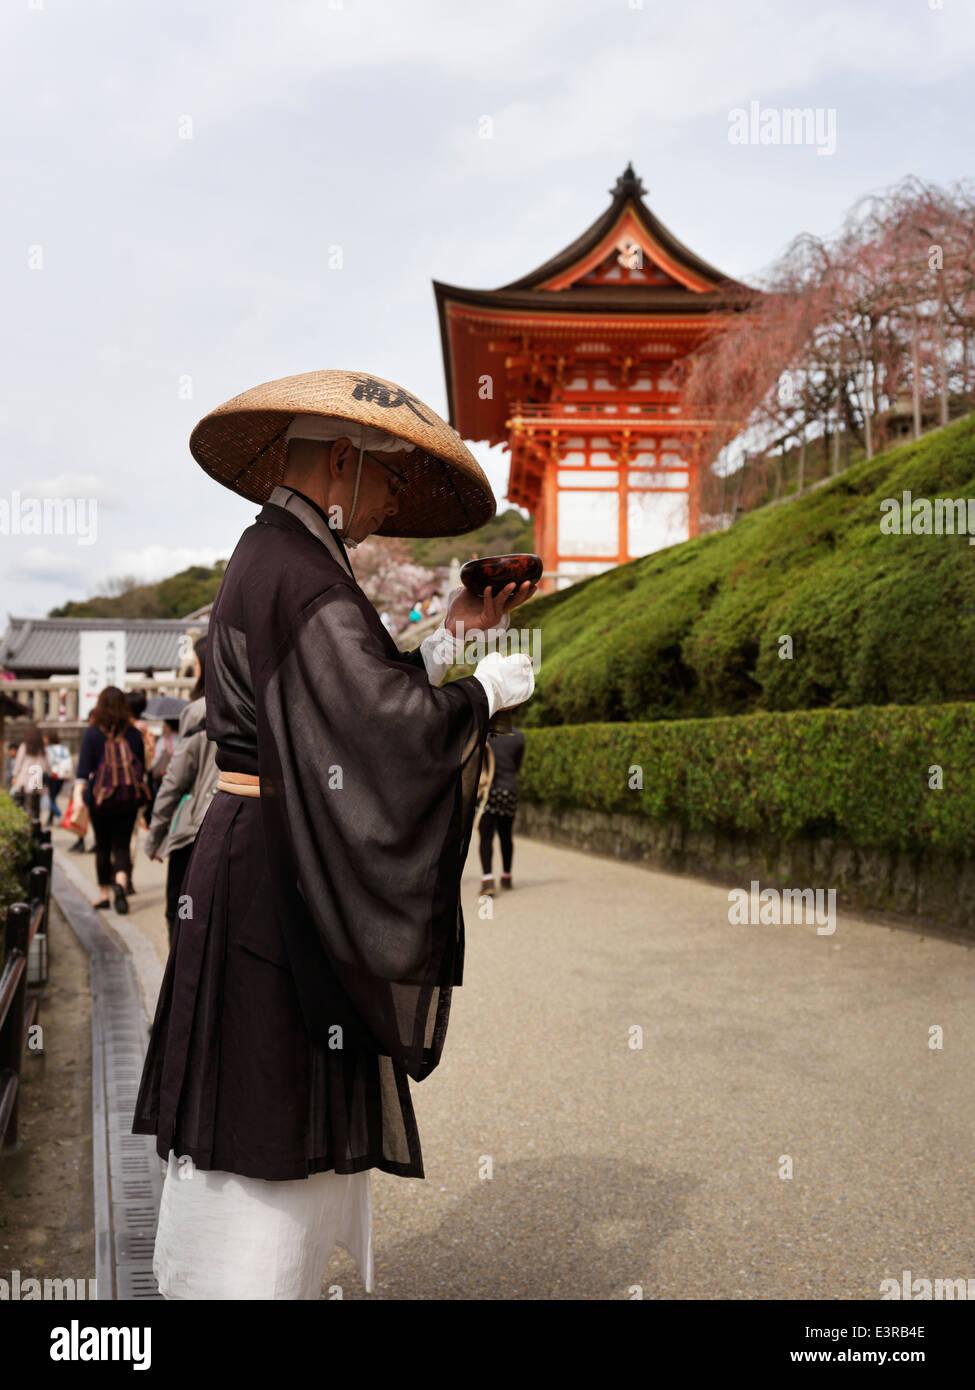 Mendicant Buddhist monk asking for donations. Kiyomizu-dera Buddhist temple, Kyoto, Japan. - Stock Image